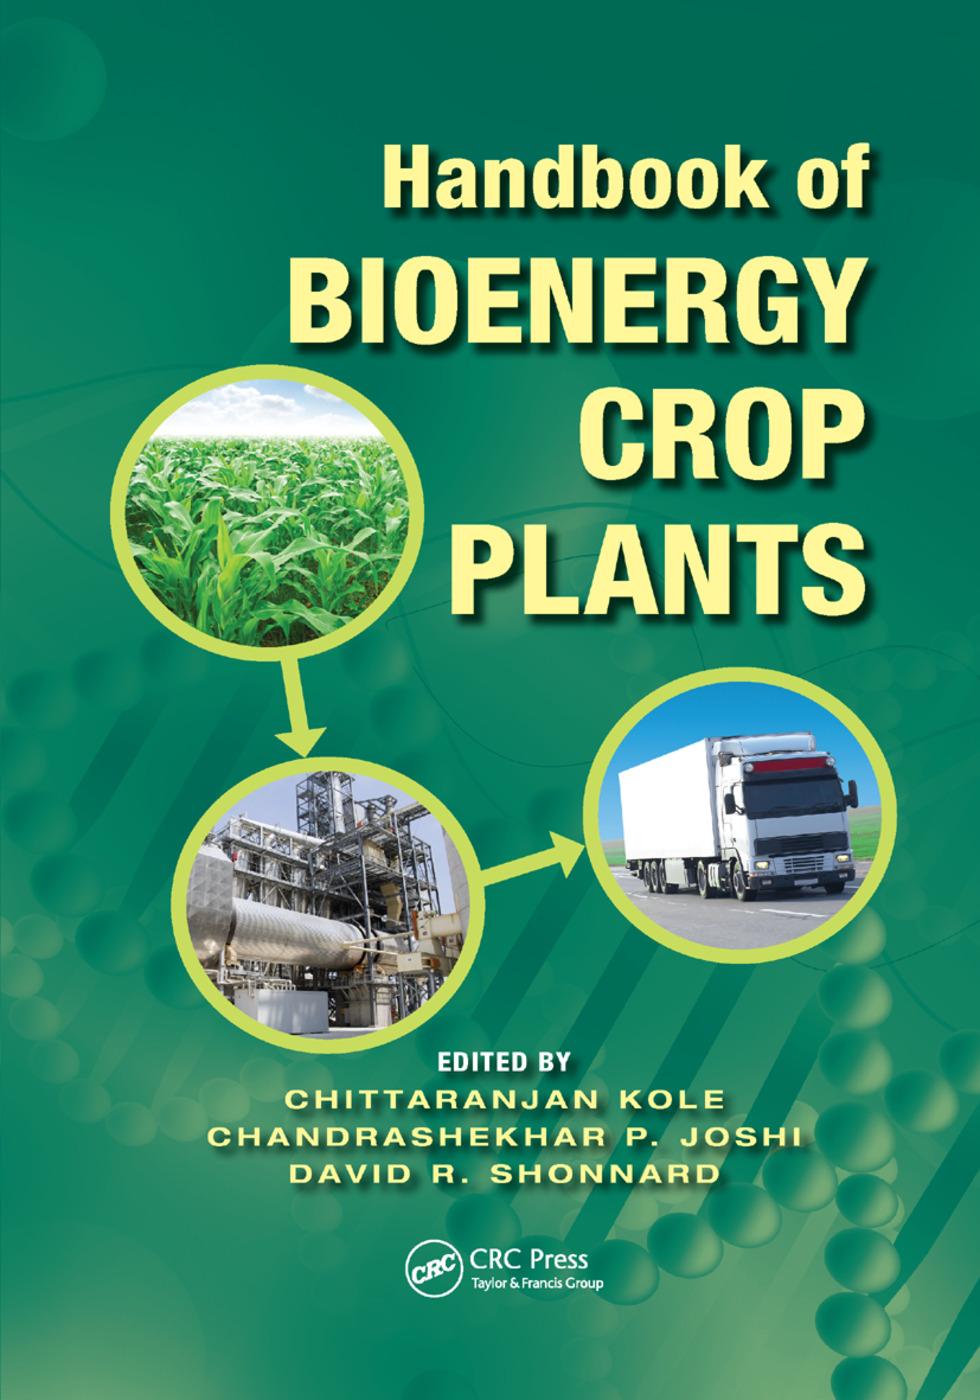 Handbook of Bioenergy Crop Plants: 1st Edition (Paperback) book cover